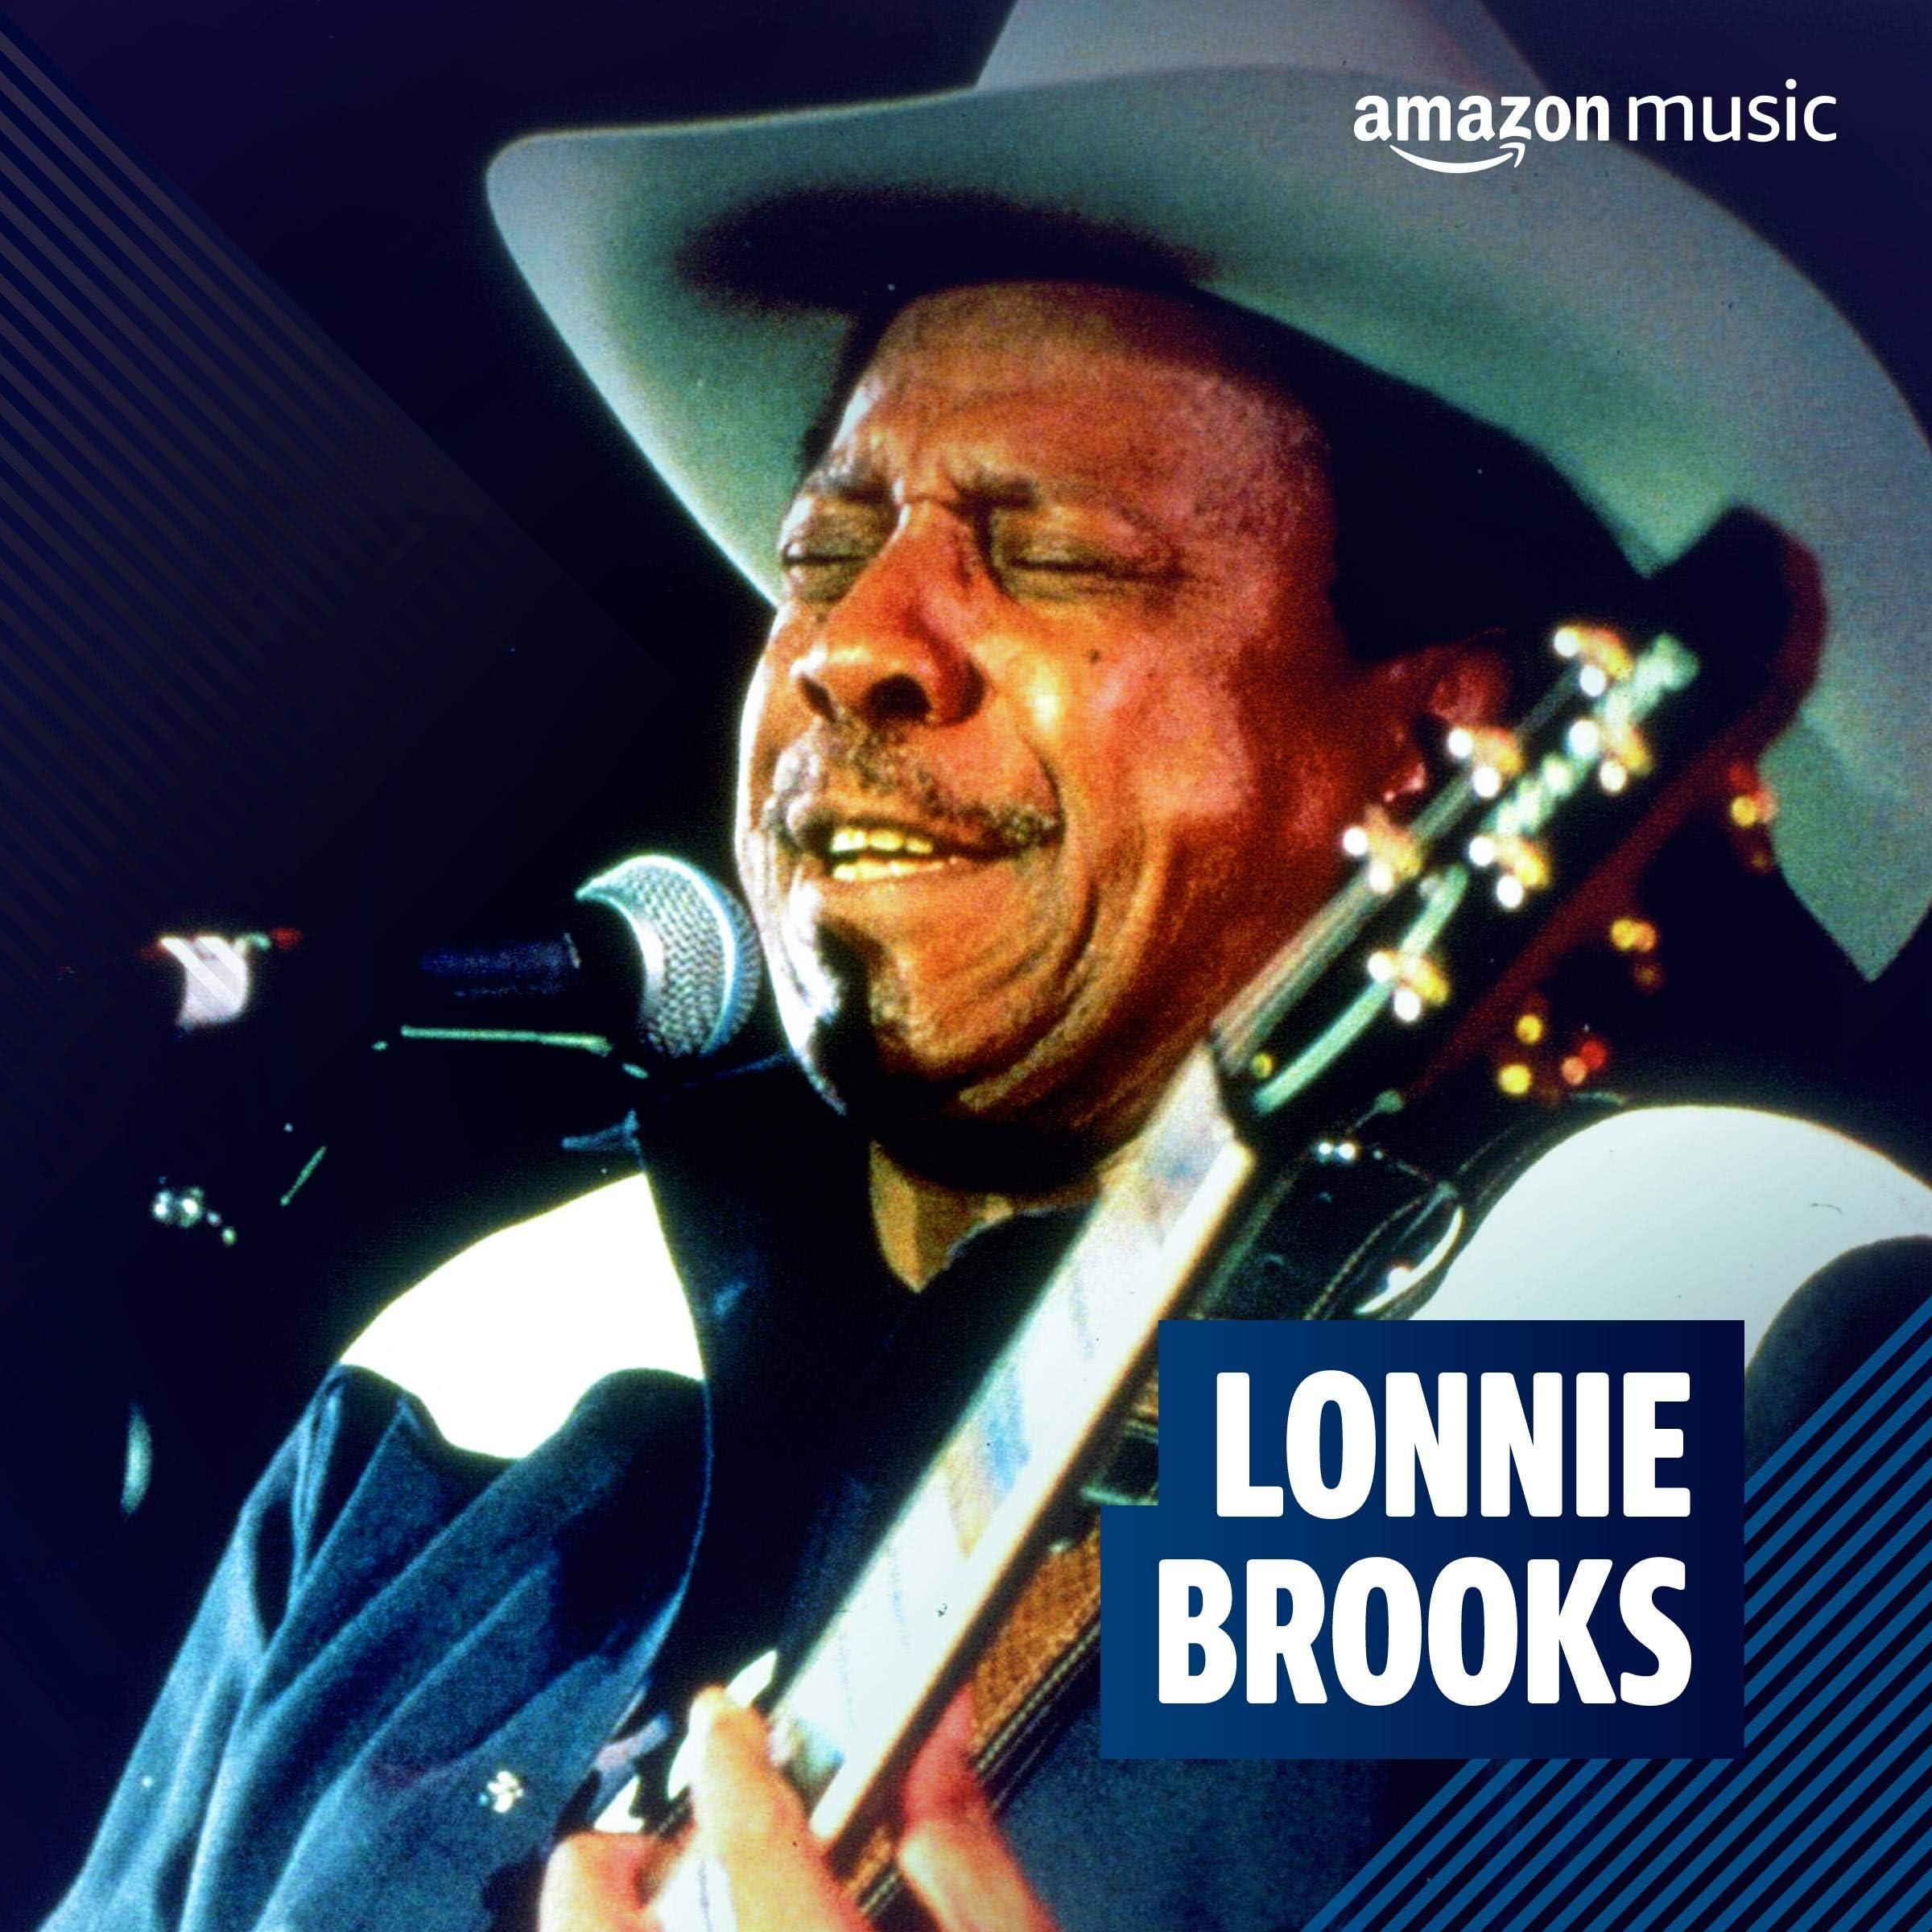 Lonnie Brooks